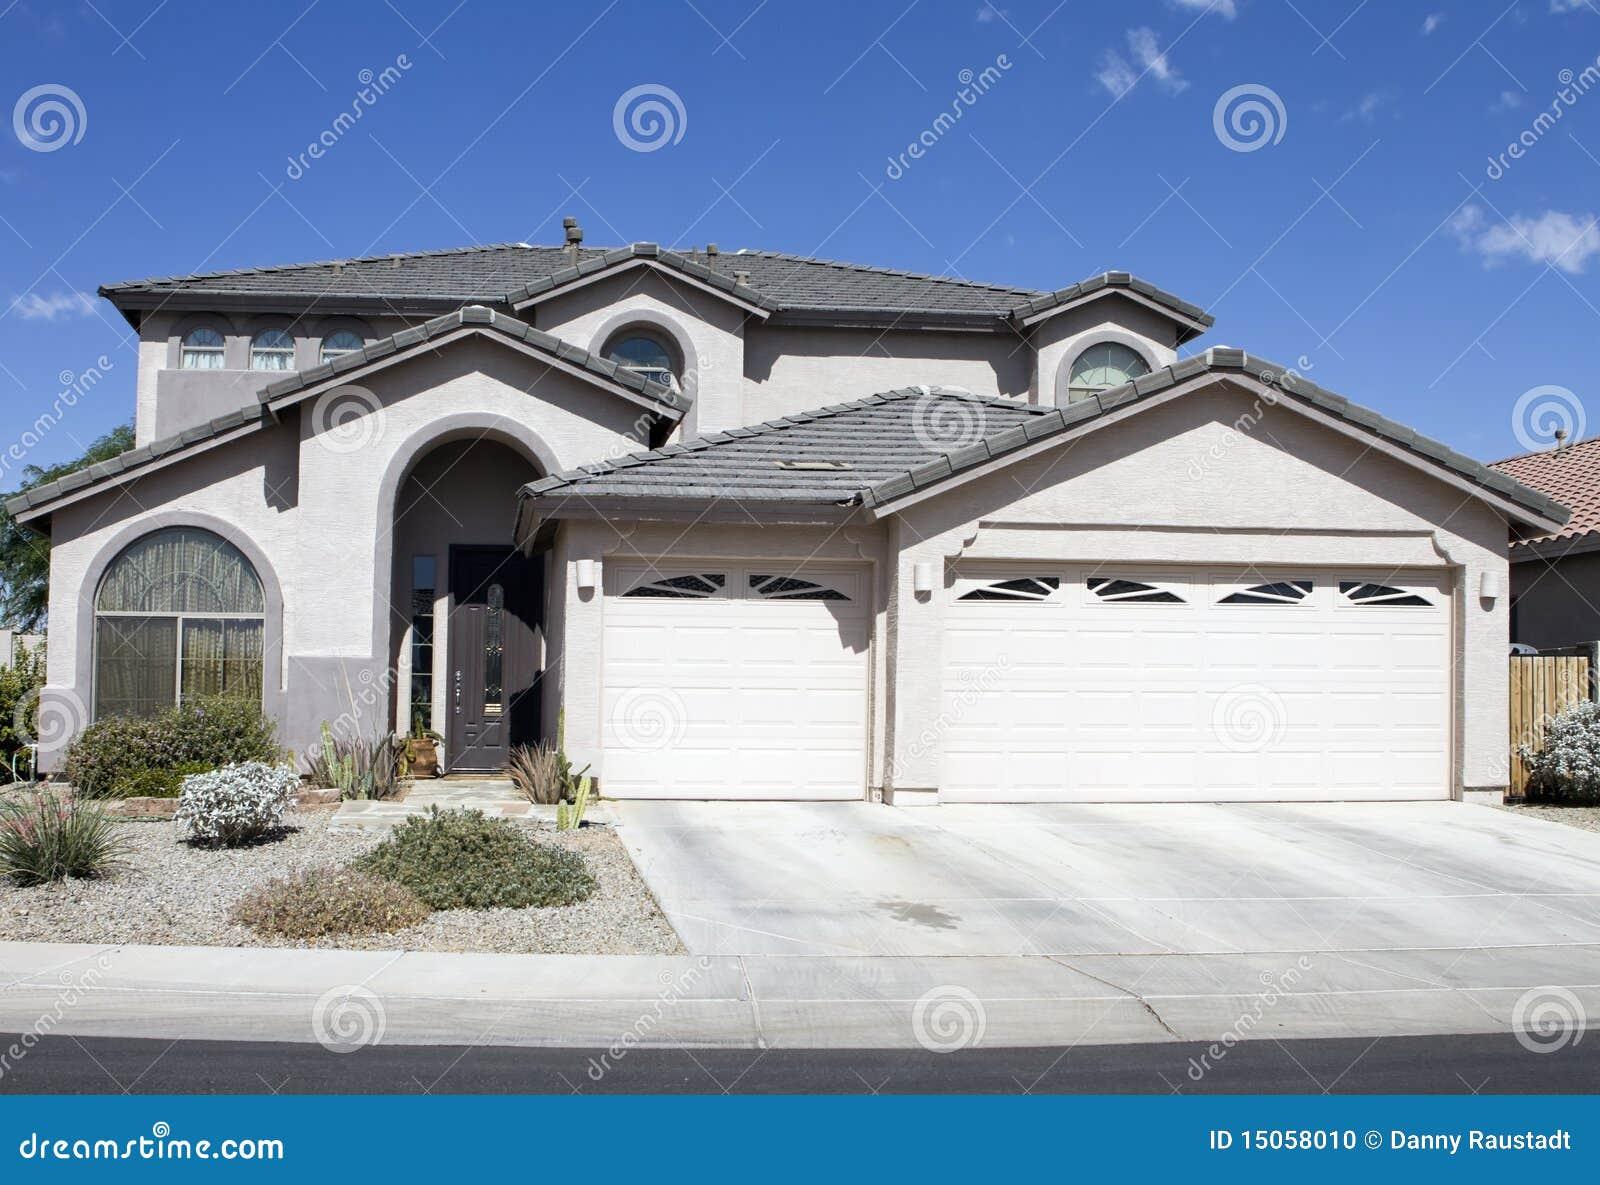 Maison classique moderne neuve photo stock image 15058010 for Image maison classique